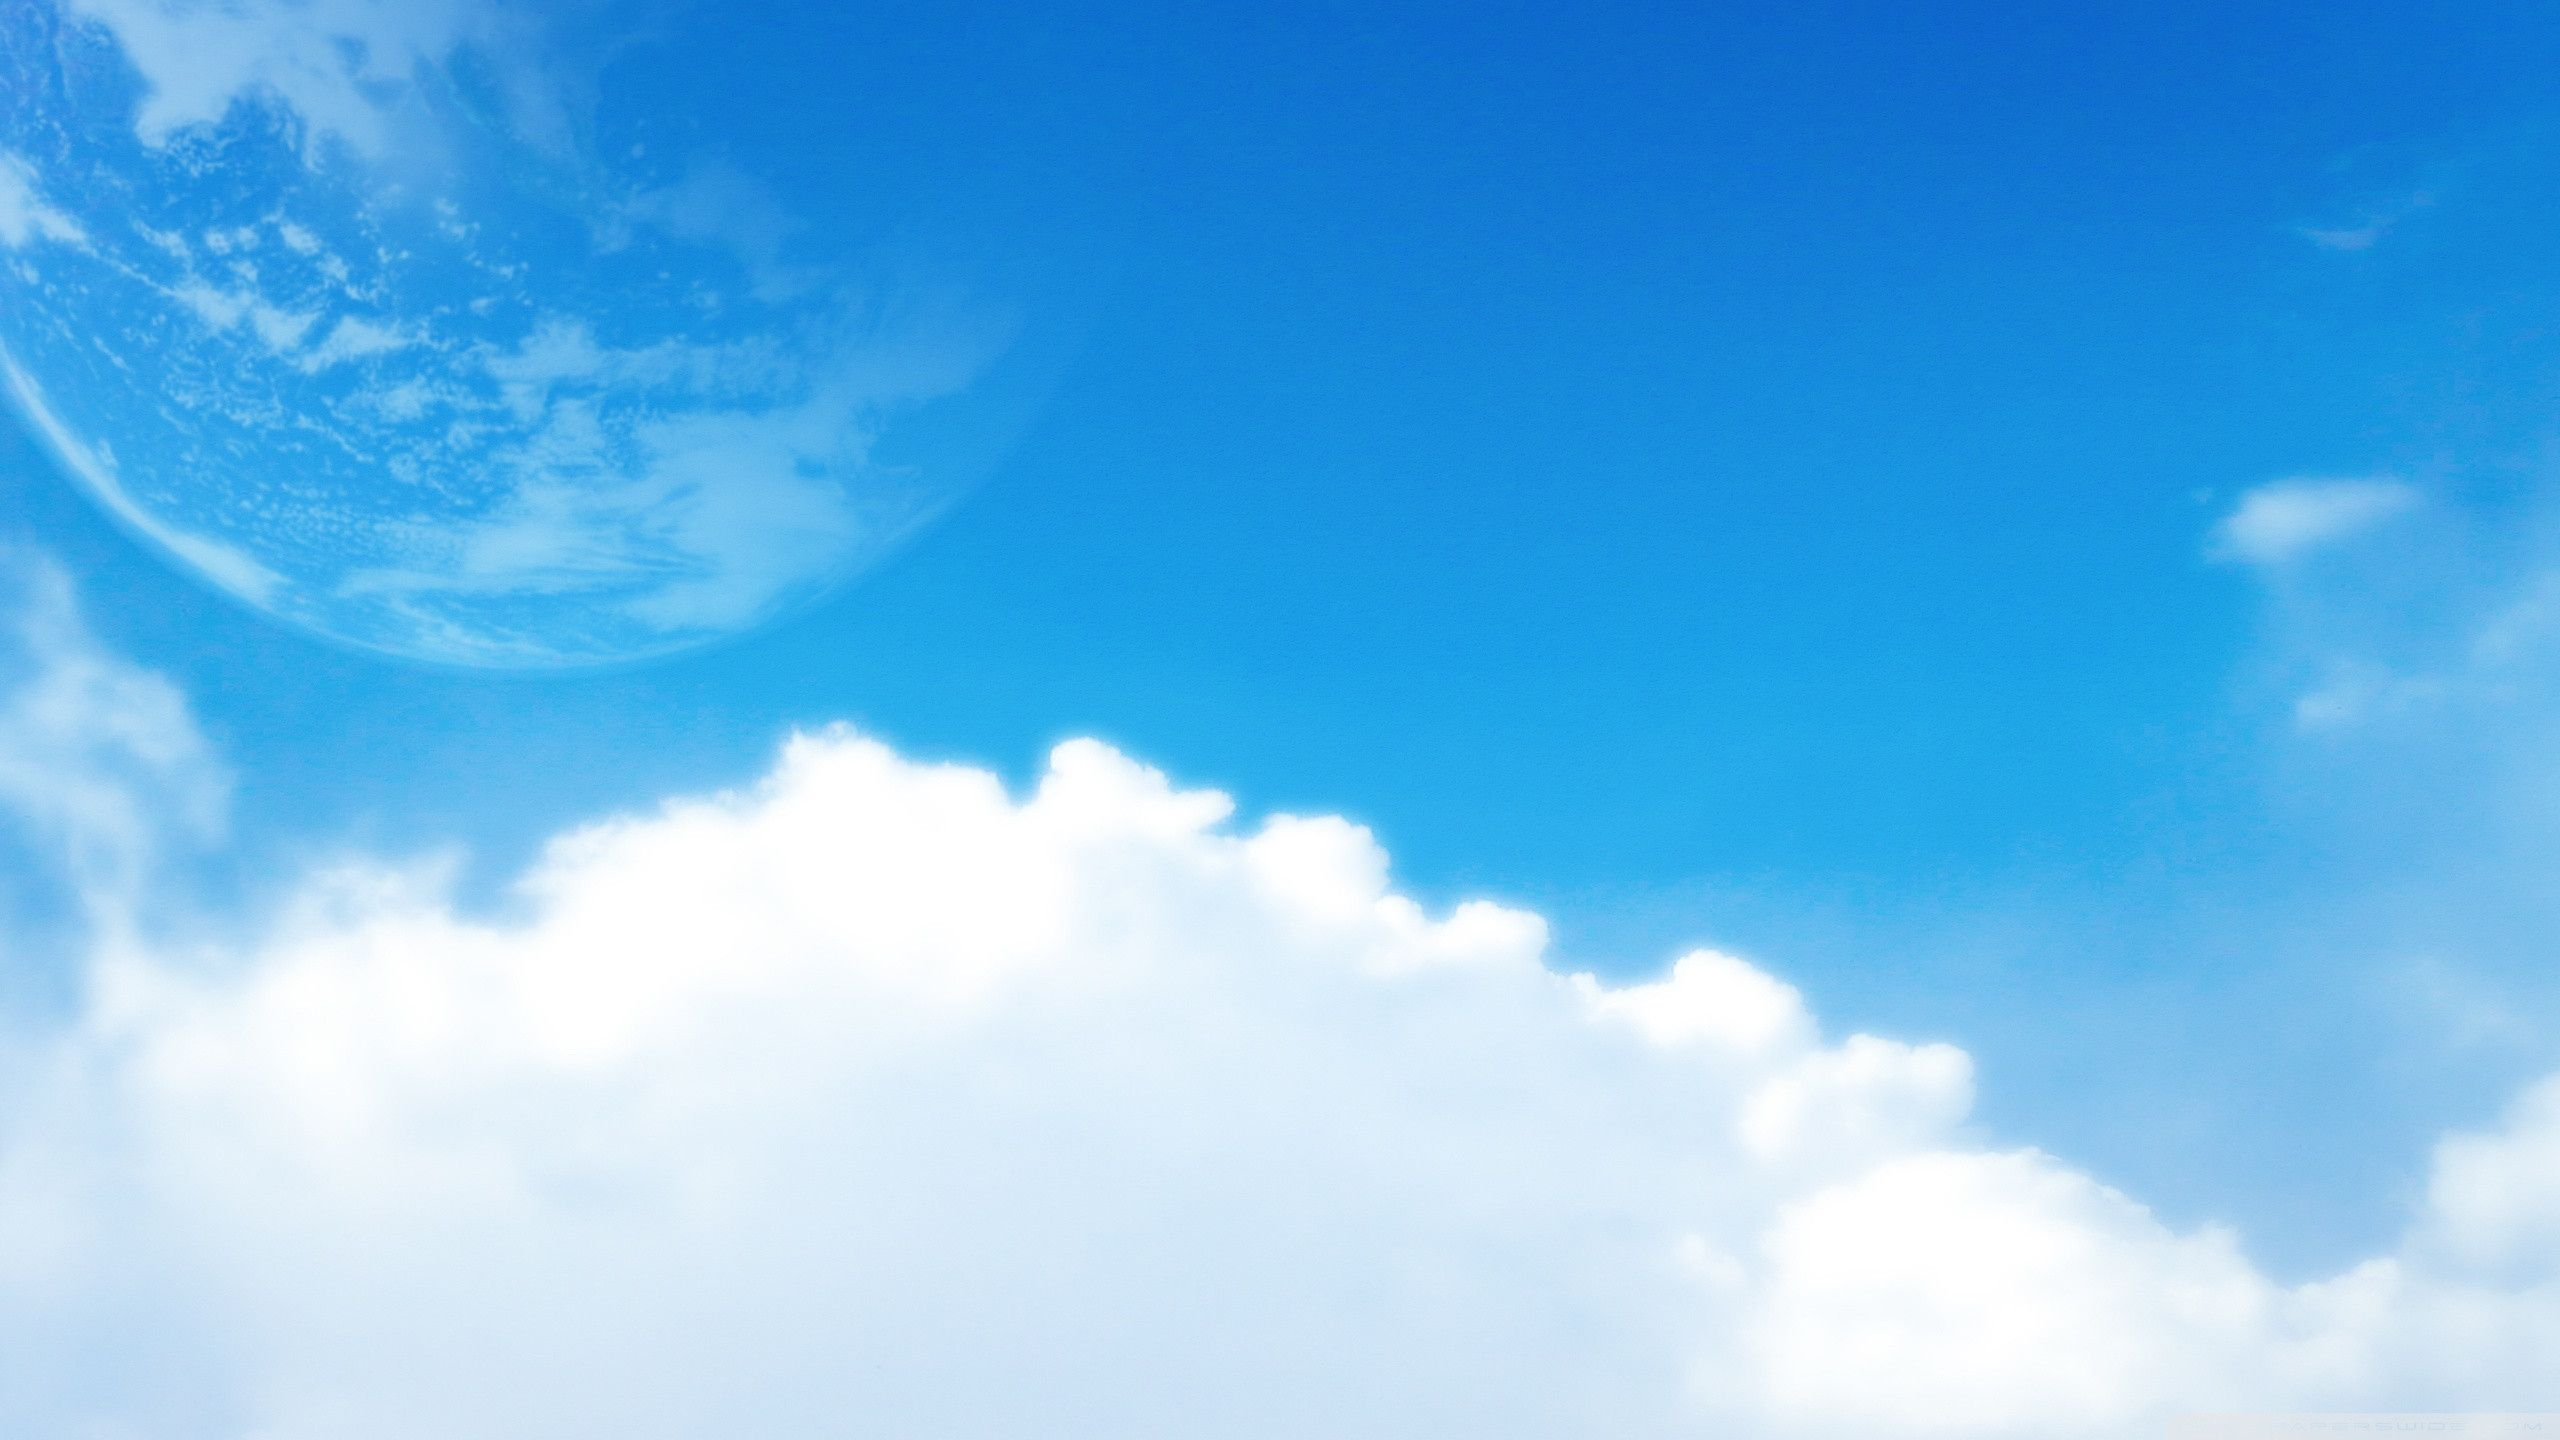 Blue Sky HD desktop wallpaper : Widescreen : Fullscreen : Mobile ...